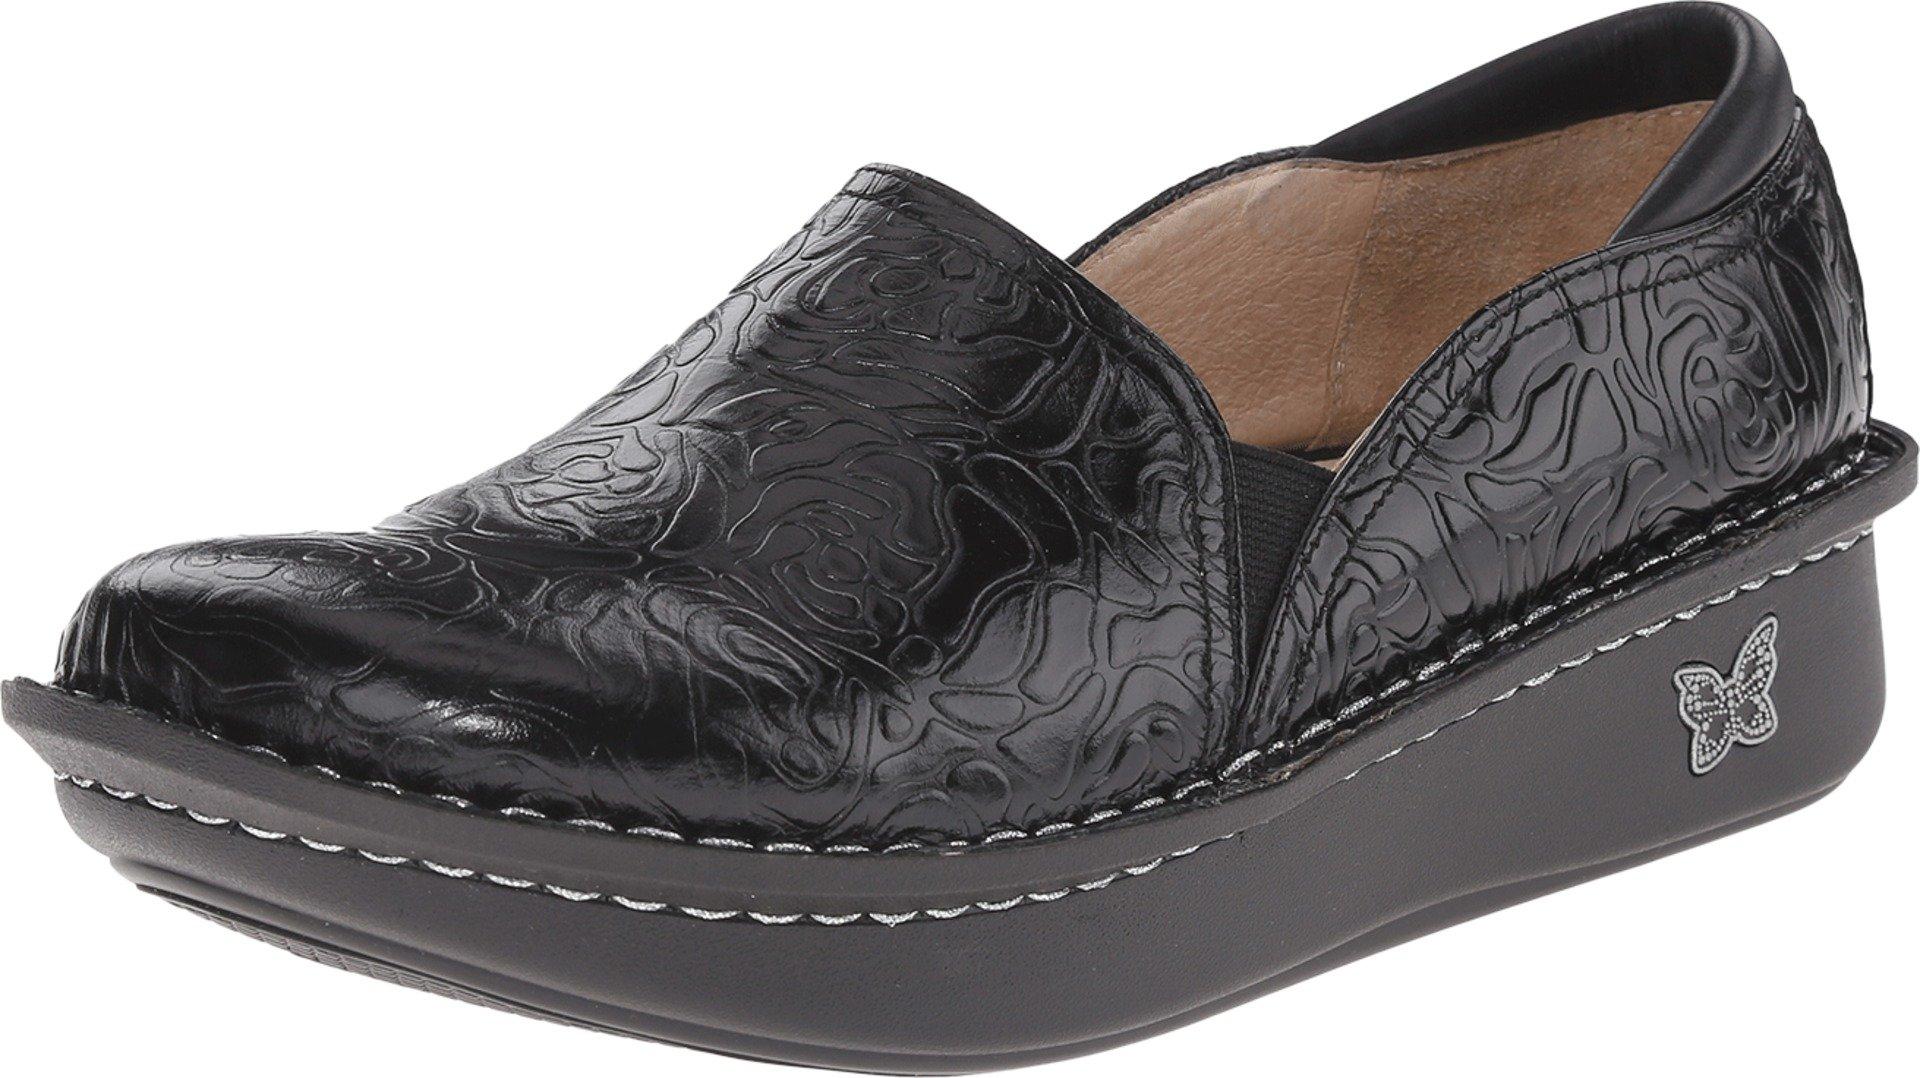 Alegria Women's Debra Professional Black Emboss Rose Leather Clog/Mule 37 (US Women's 7-7.5) Wide